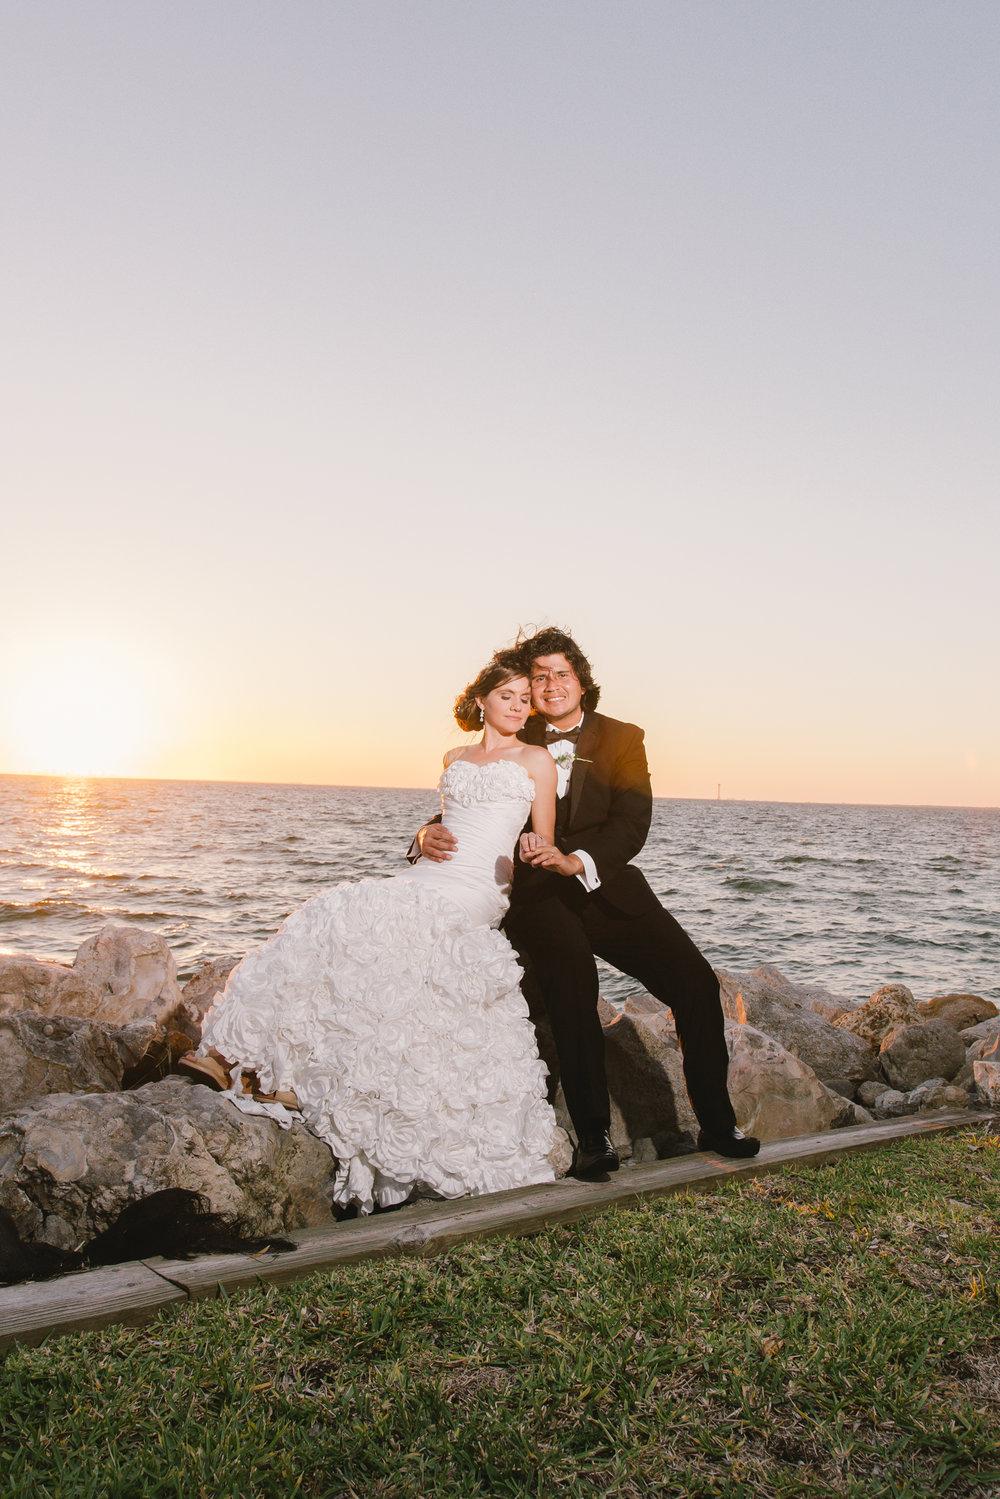 Tampa-wedding-photography, bride-and-groom-wedding-photo, Apollo-beach-wedding